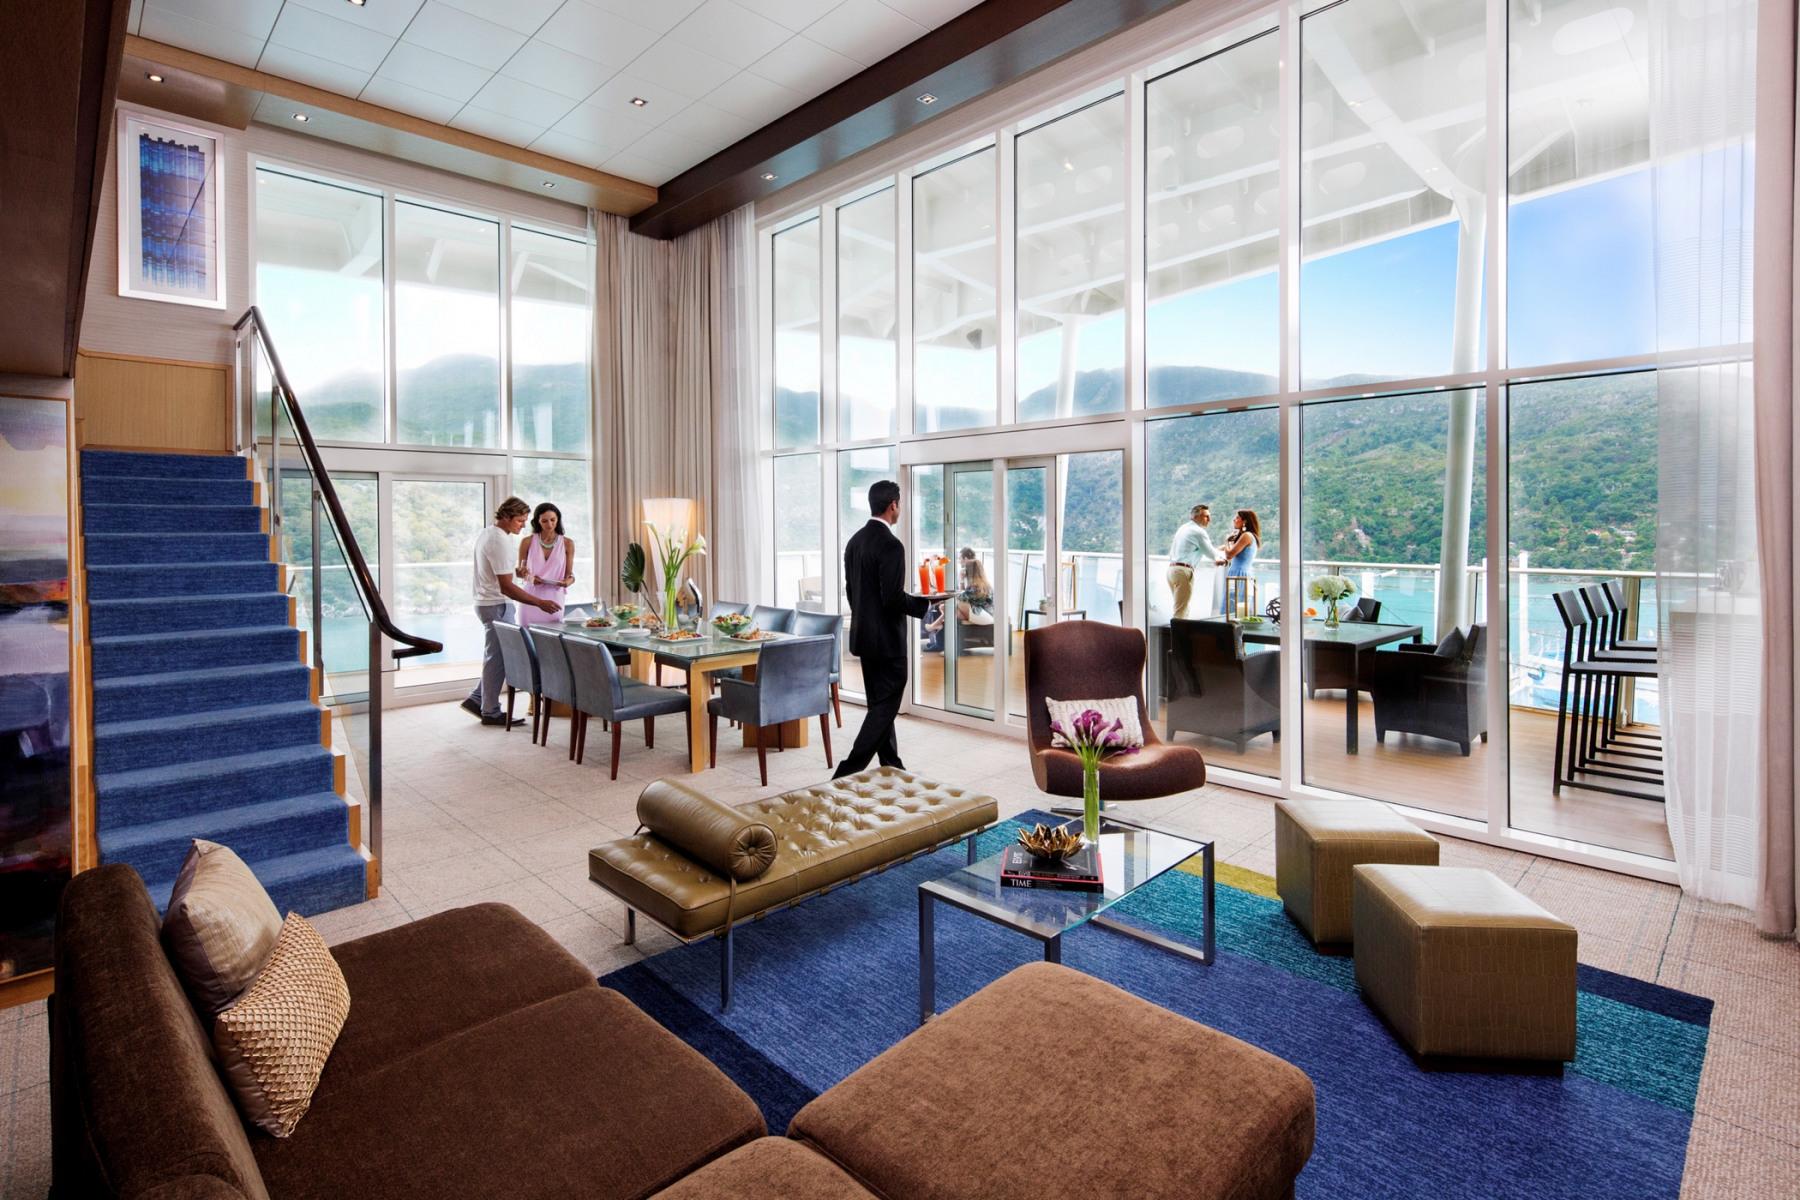 Royal Caribbean International Oasis of the seas accommodation Royal loft.jpg